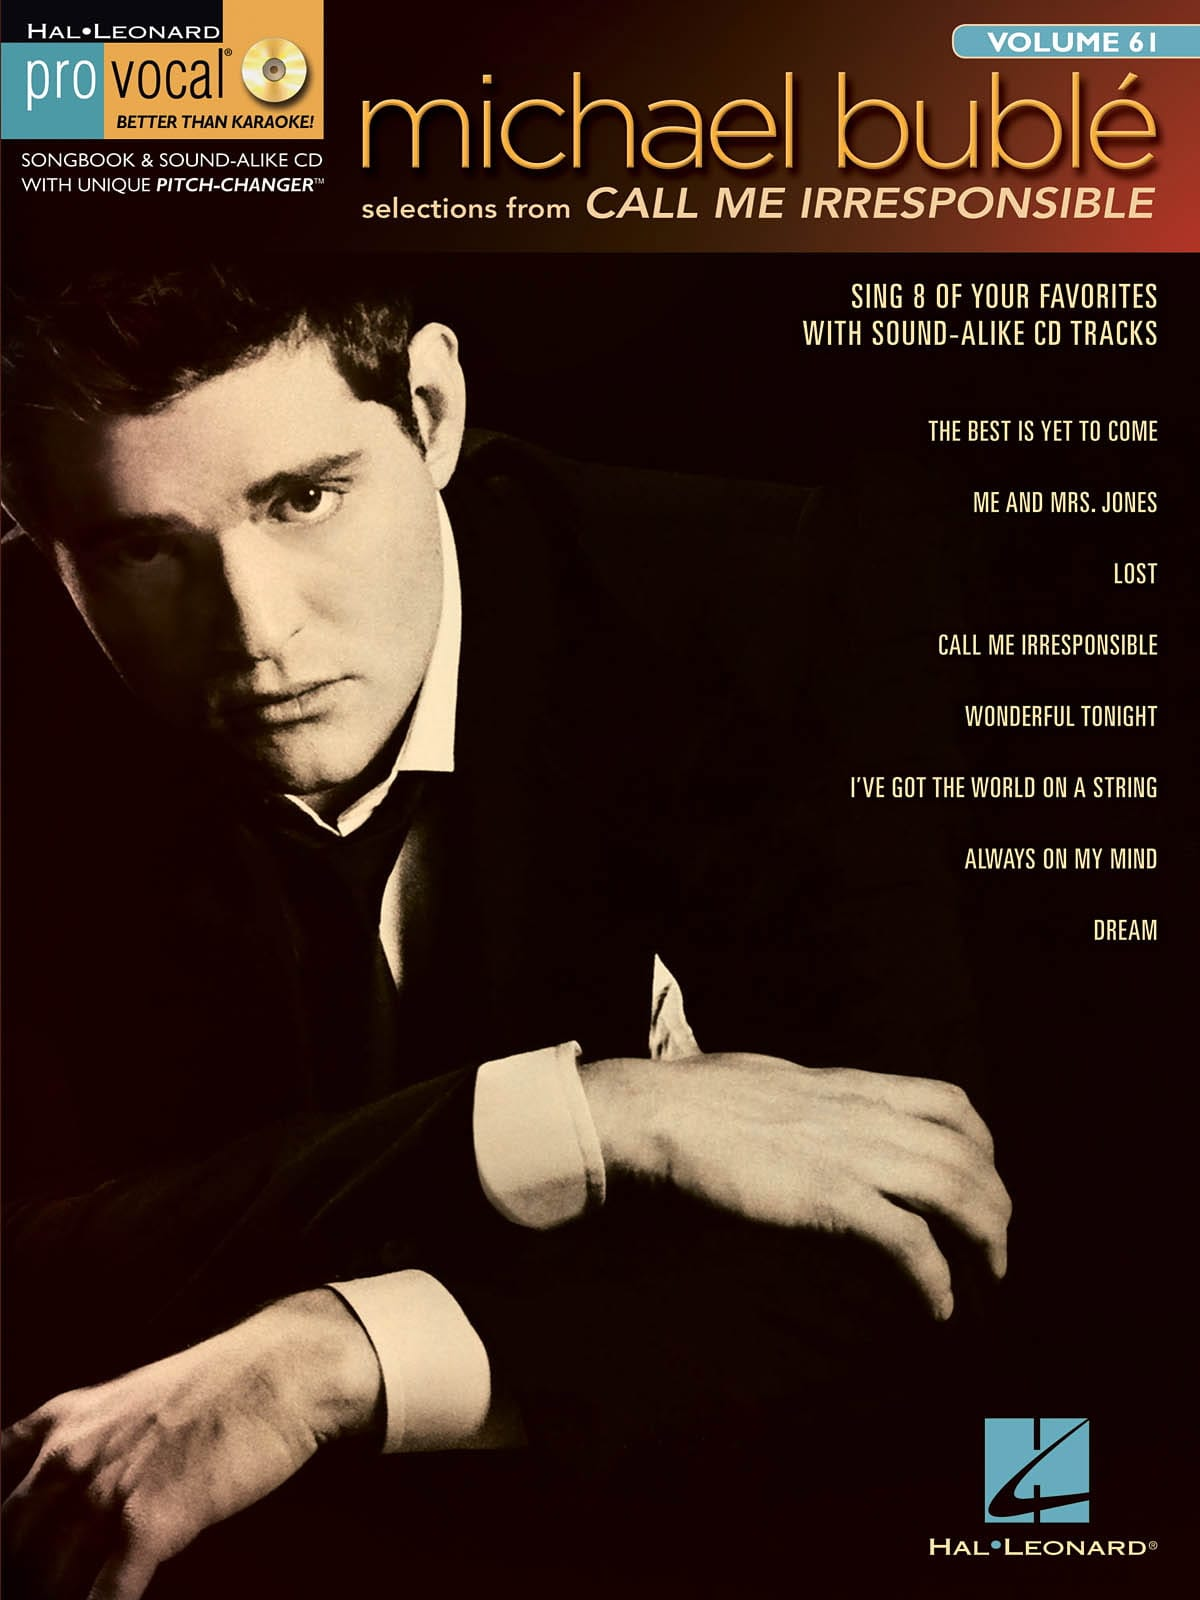 Pro Vocal Men's Edition Volume 61 - Michael Bublé - Call Me Irresponsible - laflutedepan.com